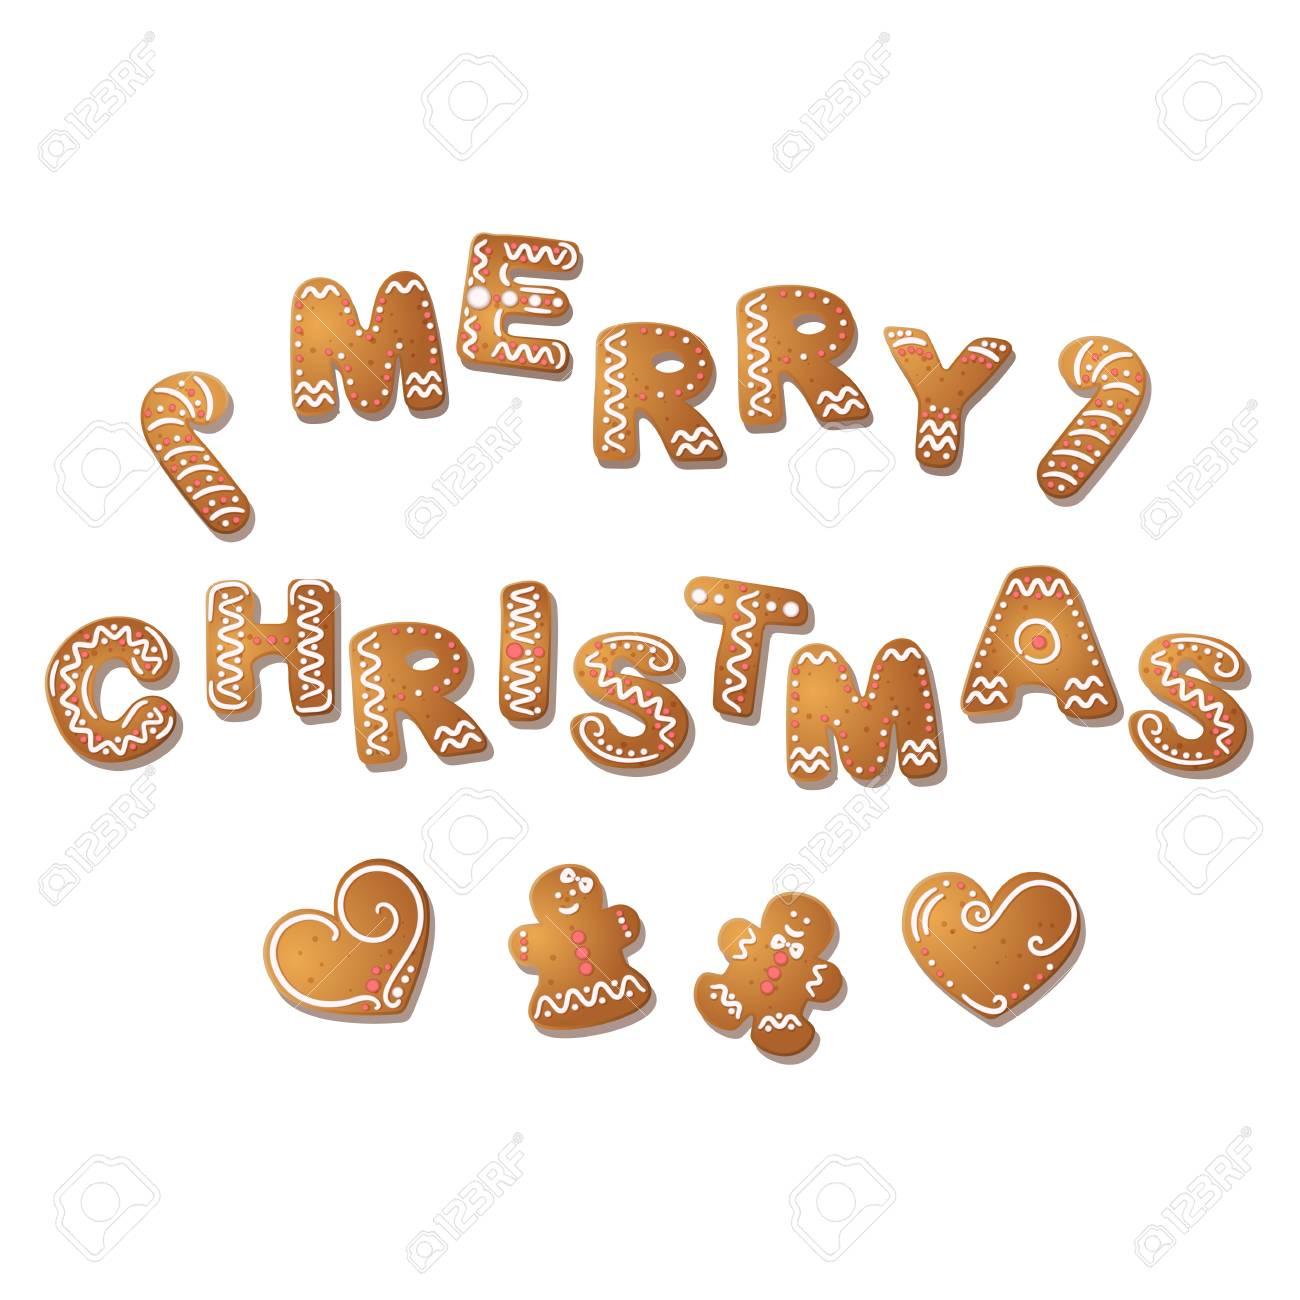 Gingerbread Inscription Merry Christmas Gingerbread Man Hearts